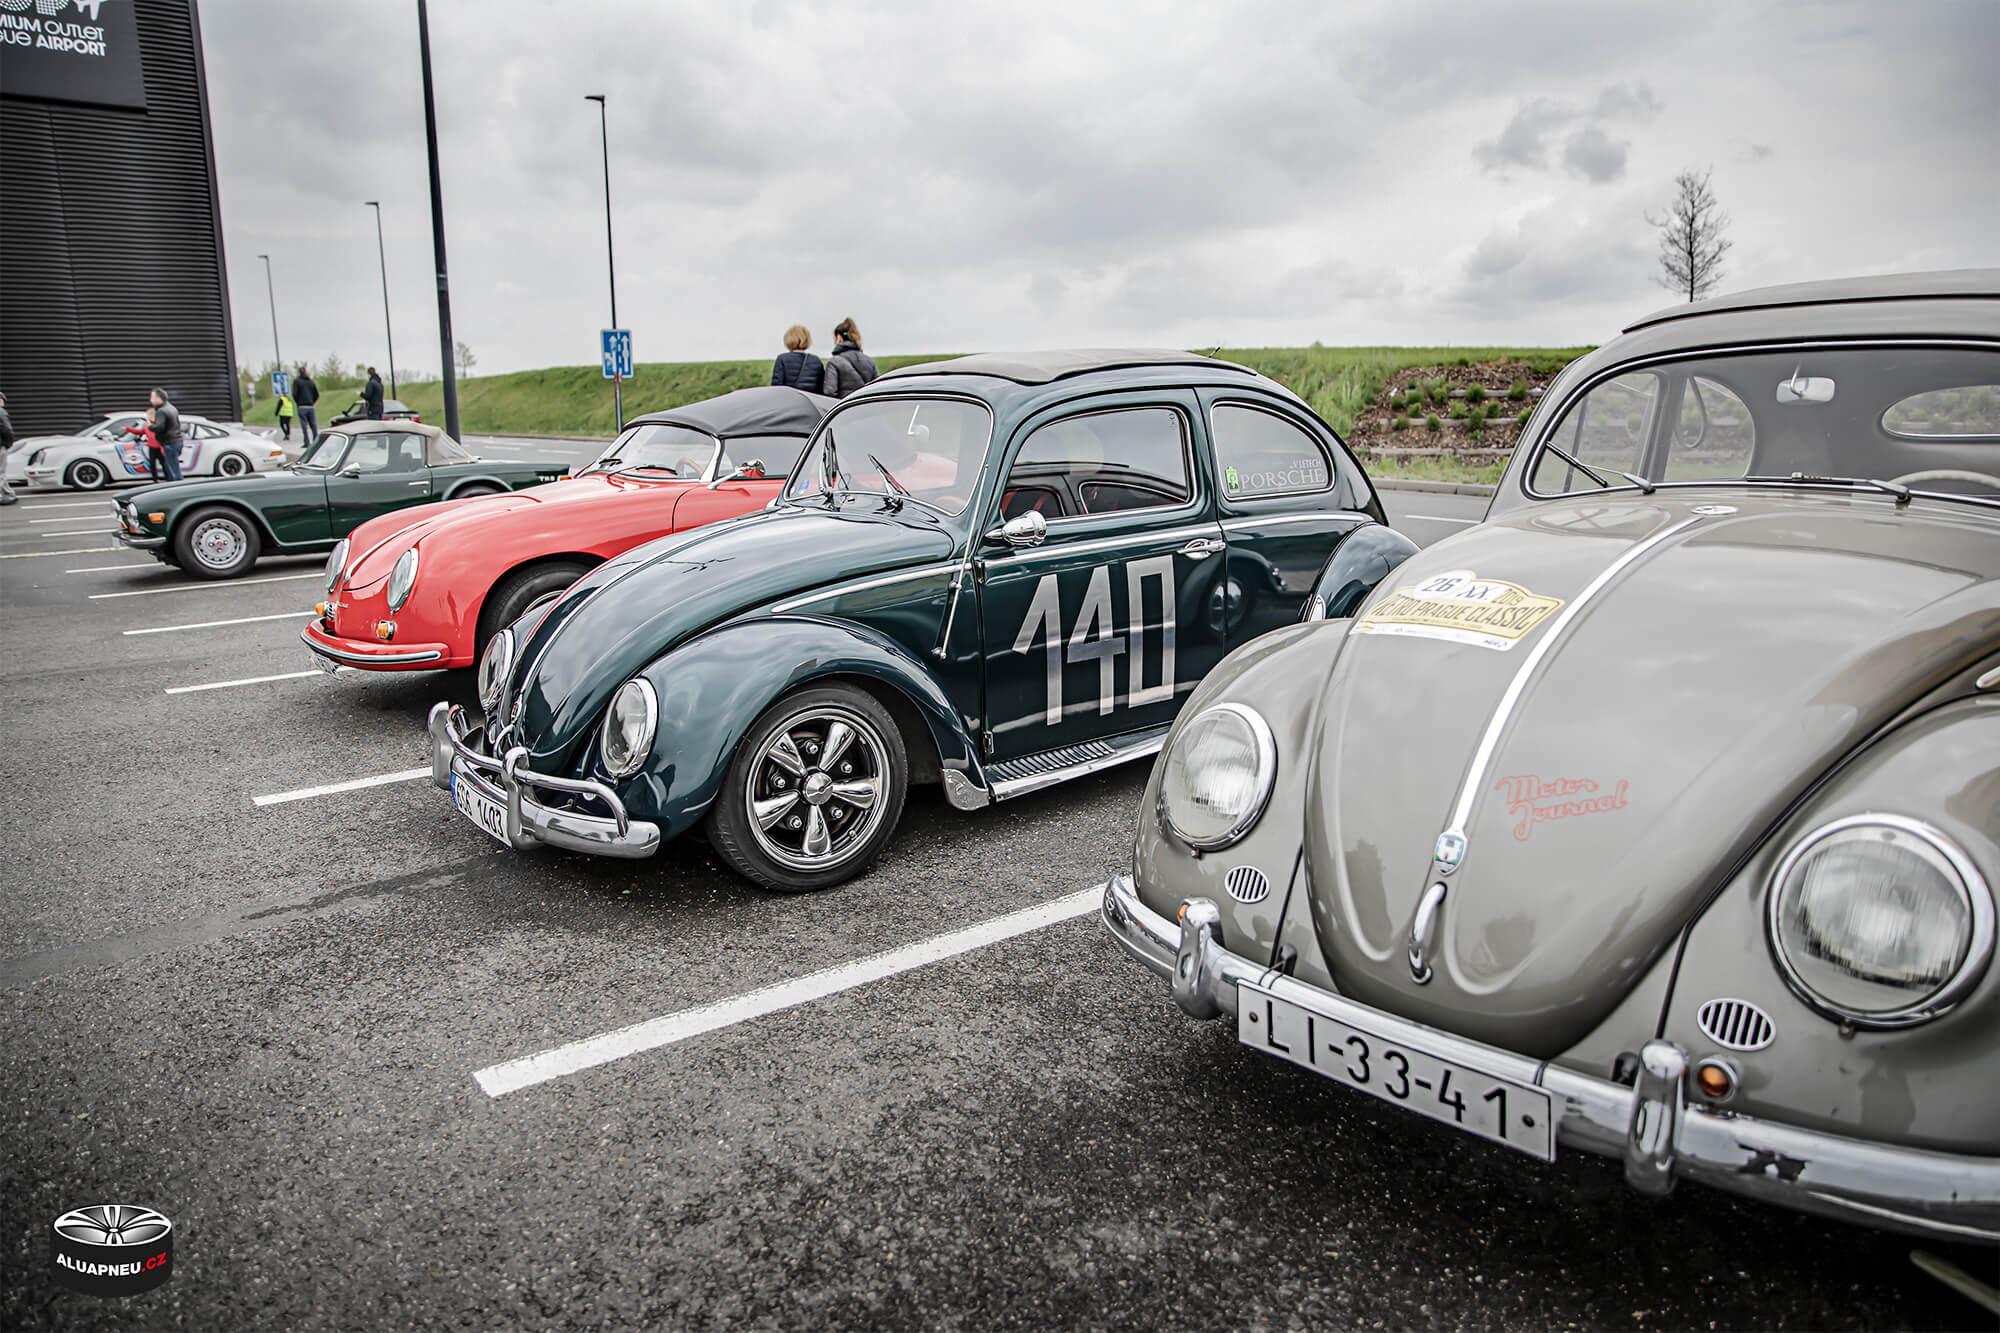 Vw Beetle - Youngtimer - www.aluapneu.cz